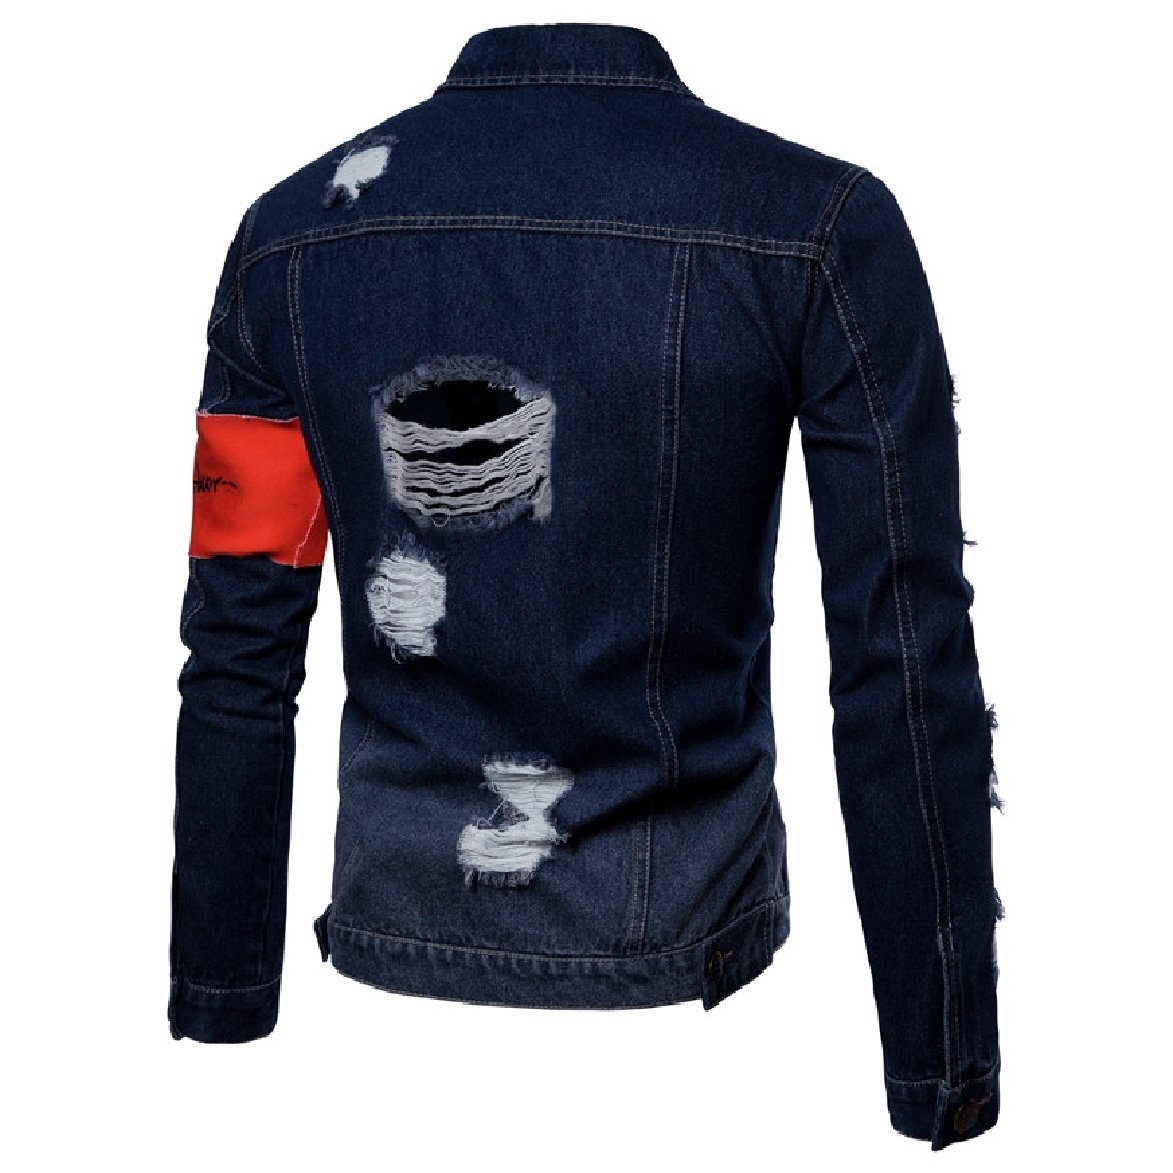 Yusky Mens Letter Printed Hole Button Down Trim-Fit Denim Jackets